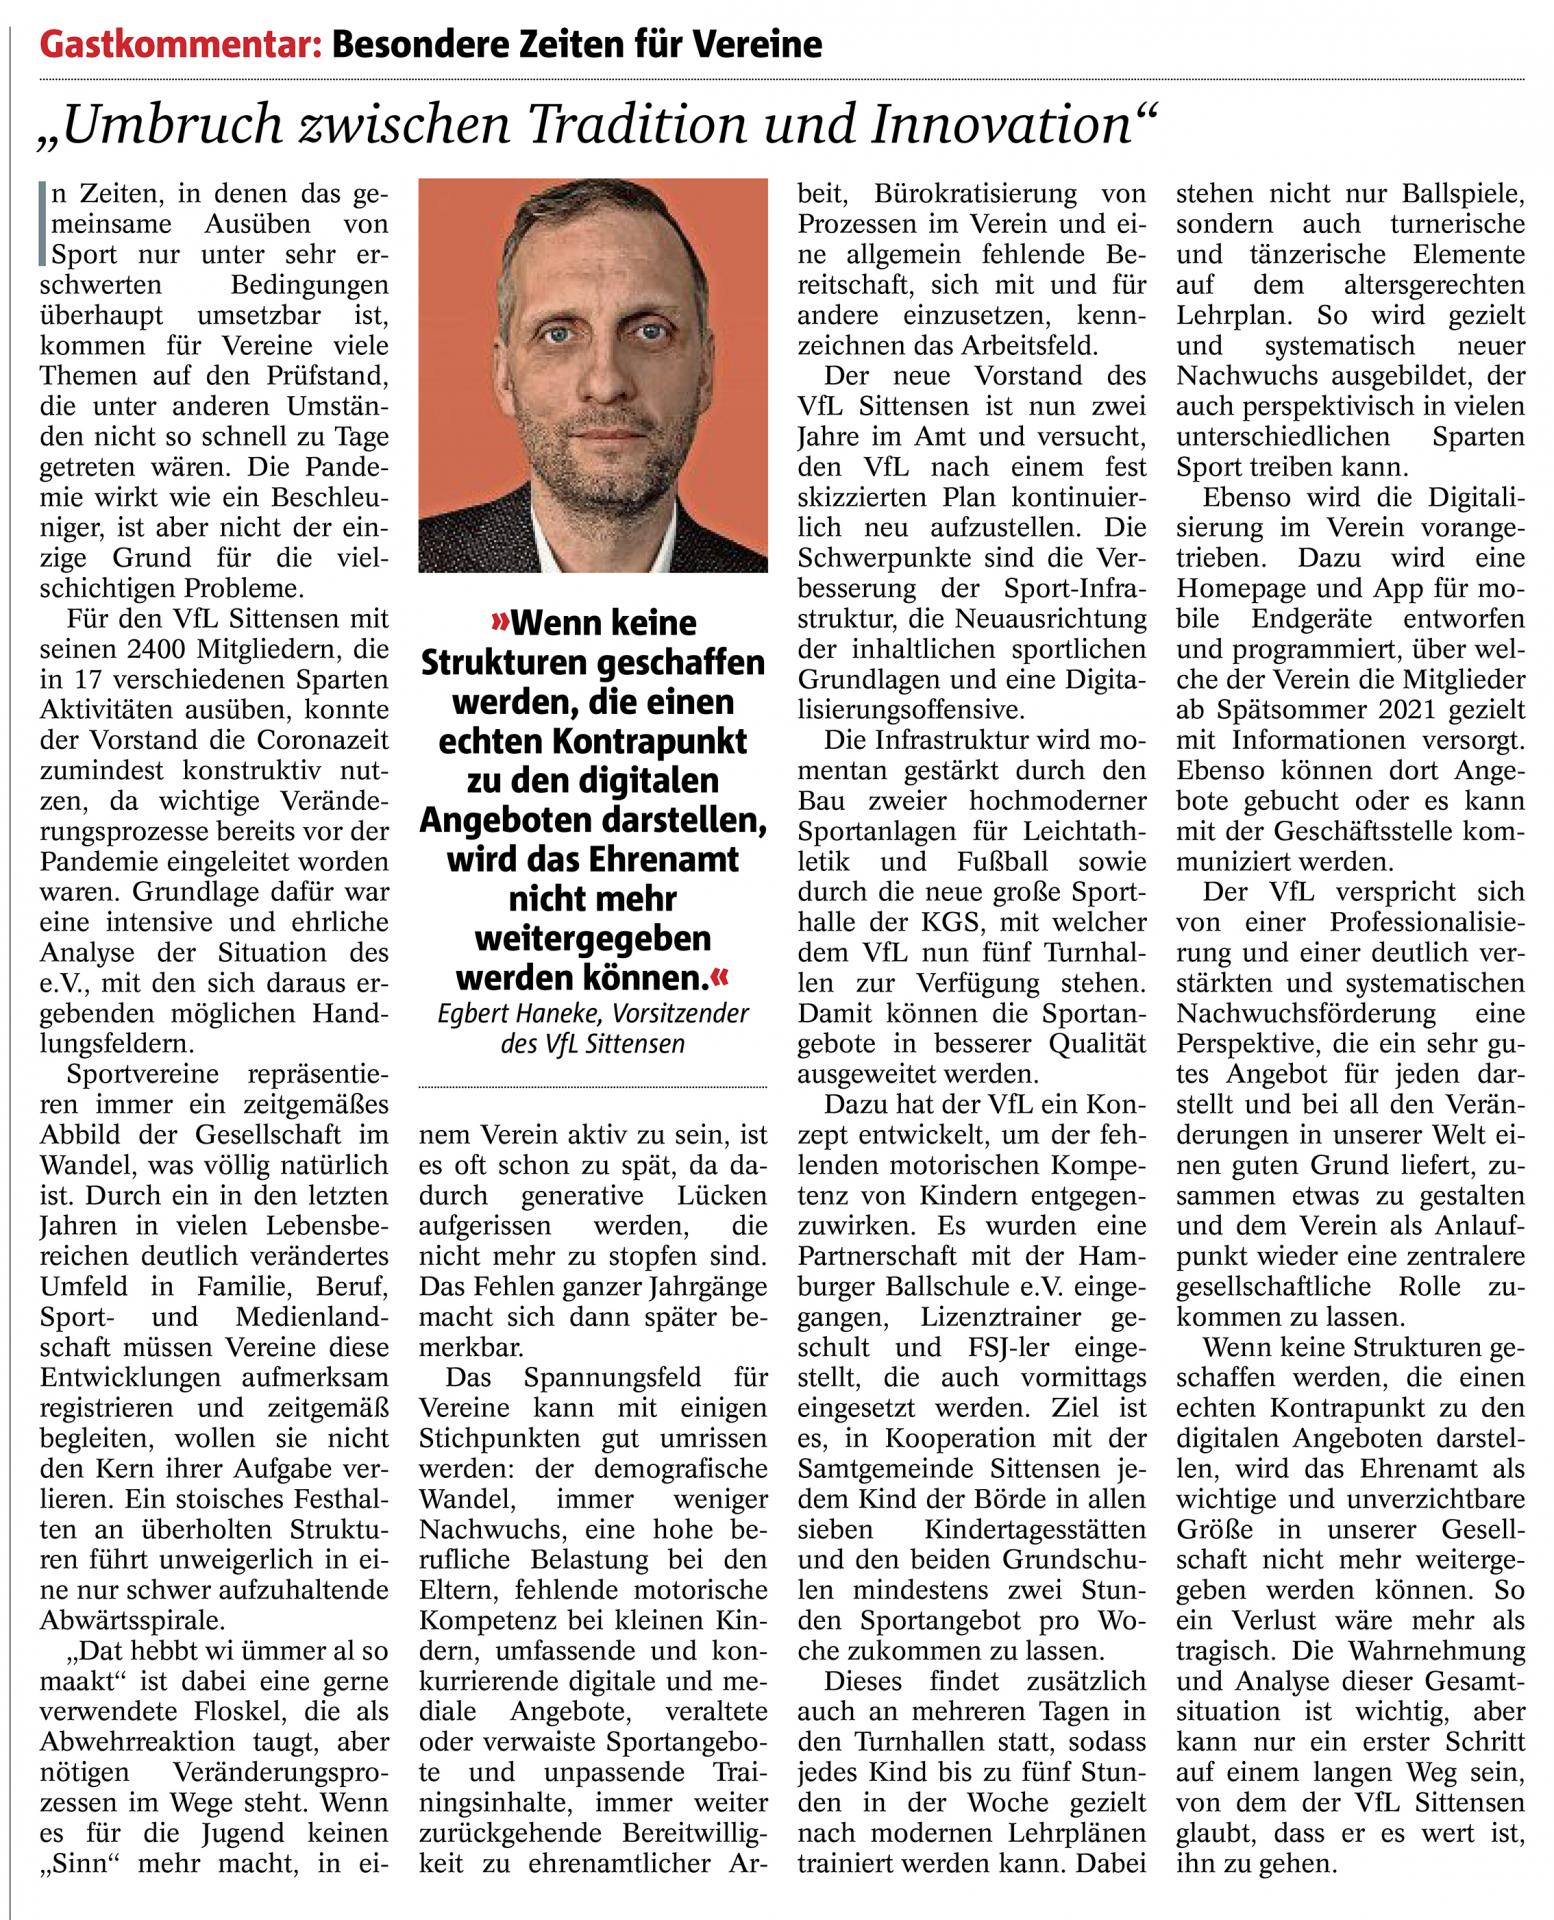 Sonntagsjournal Zevener Zeitung 30.5.2021